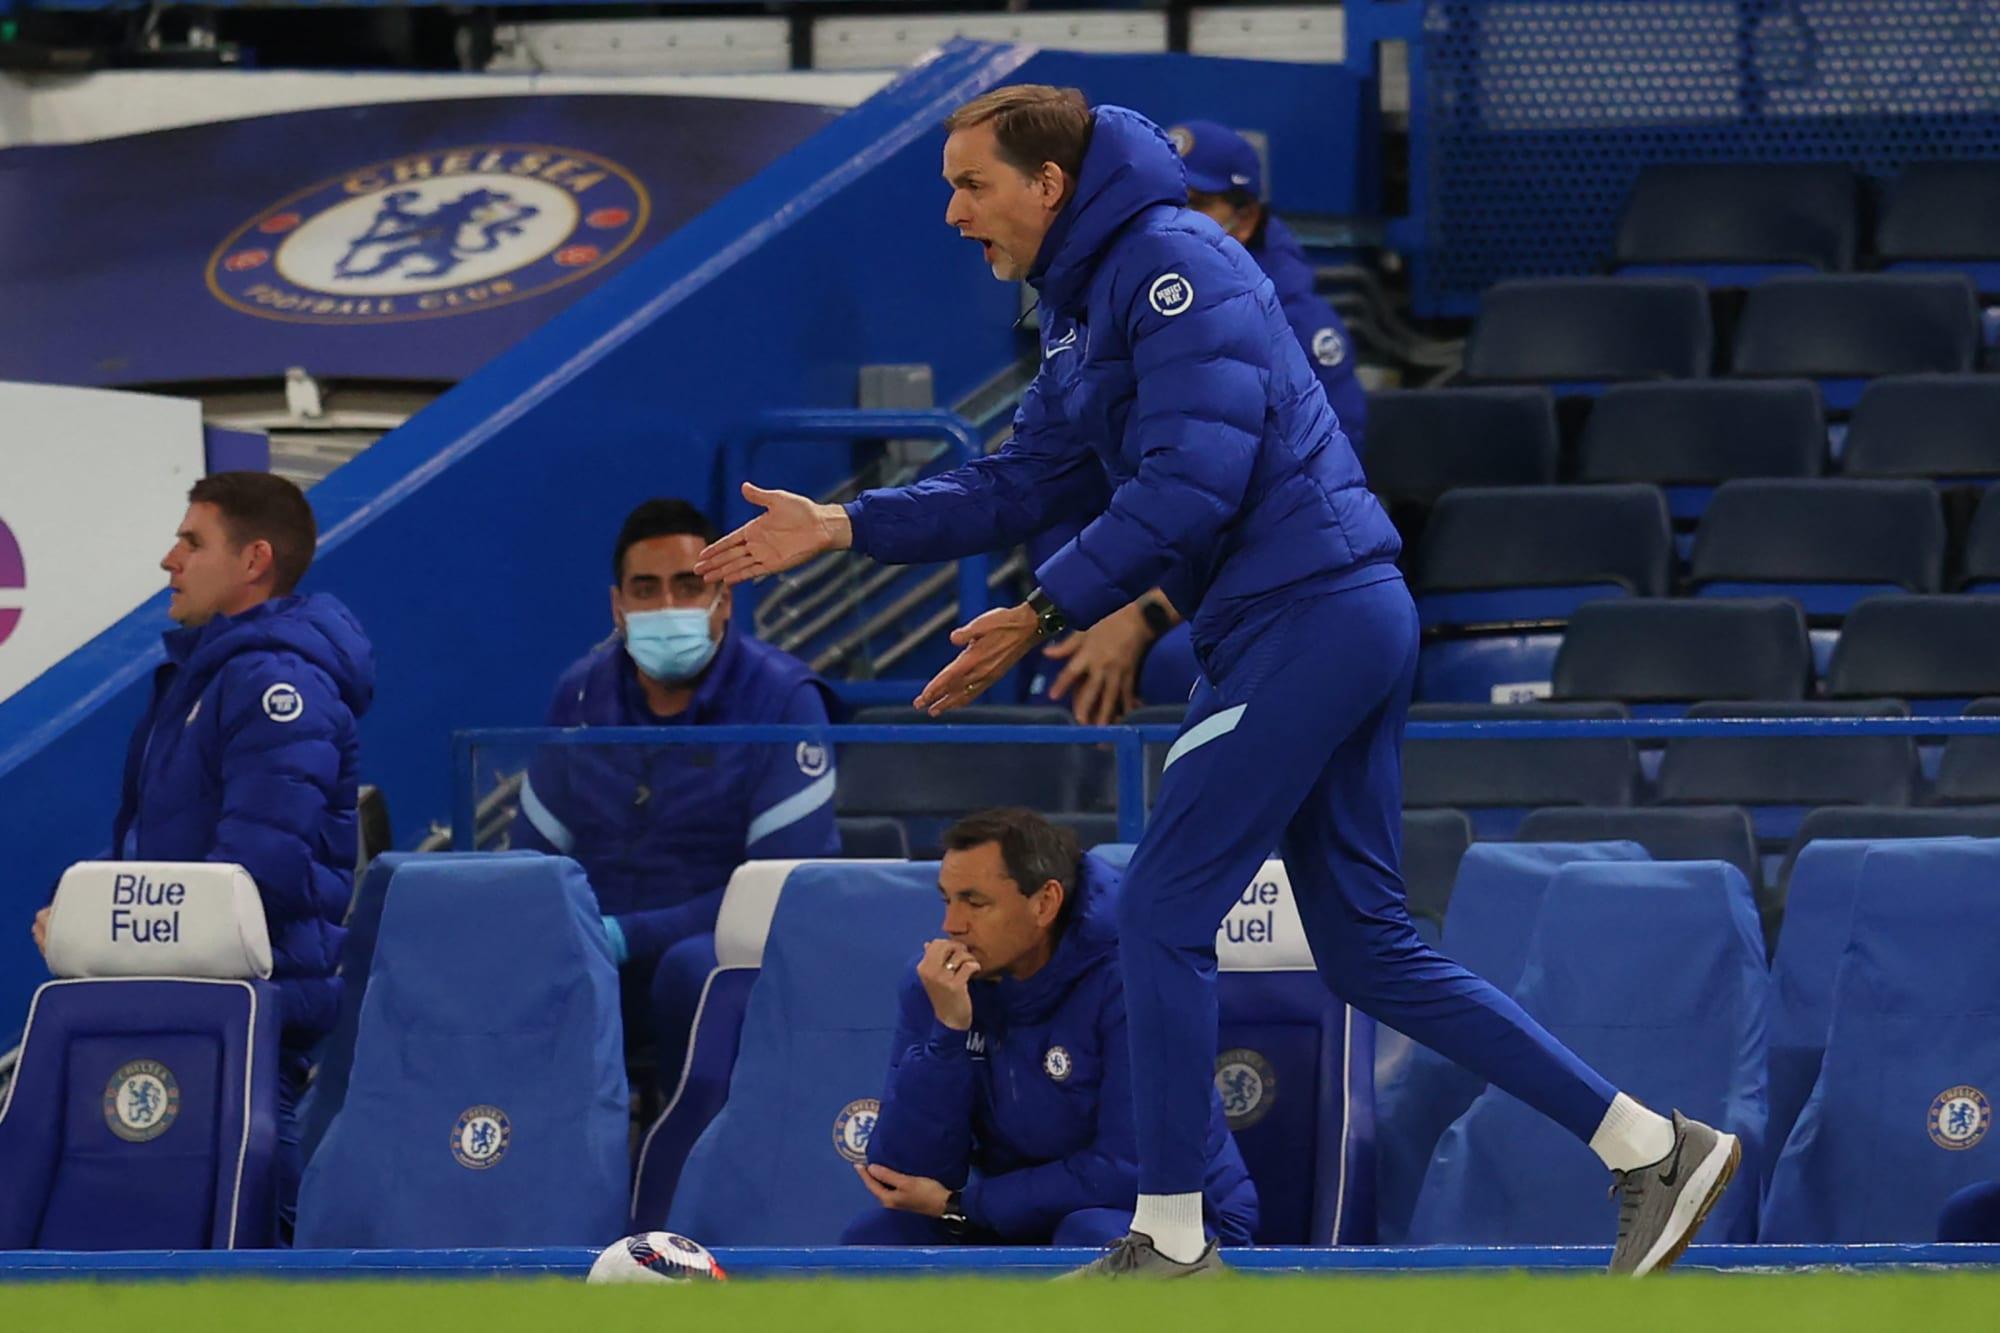 Chelsea: Examining Thomas Tuchel's biggest mistake, the 3-5-2